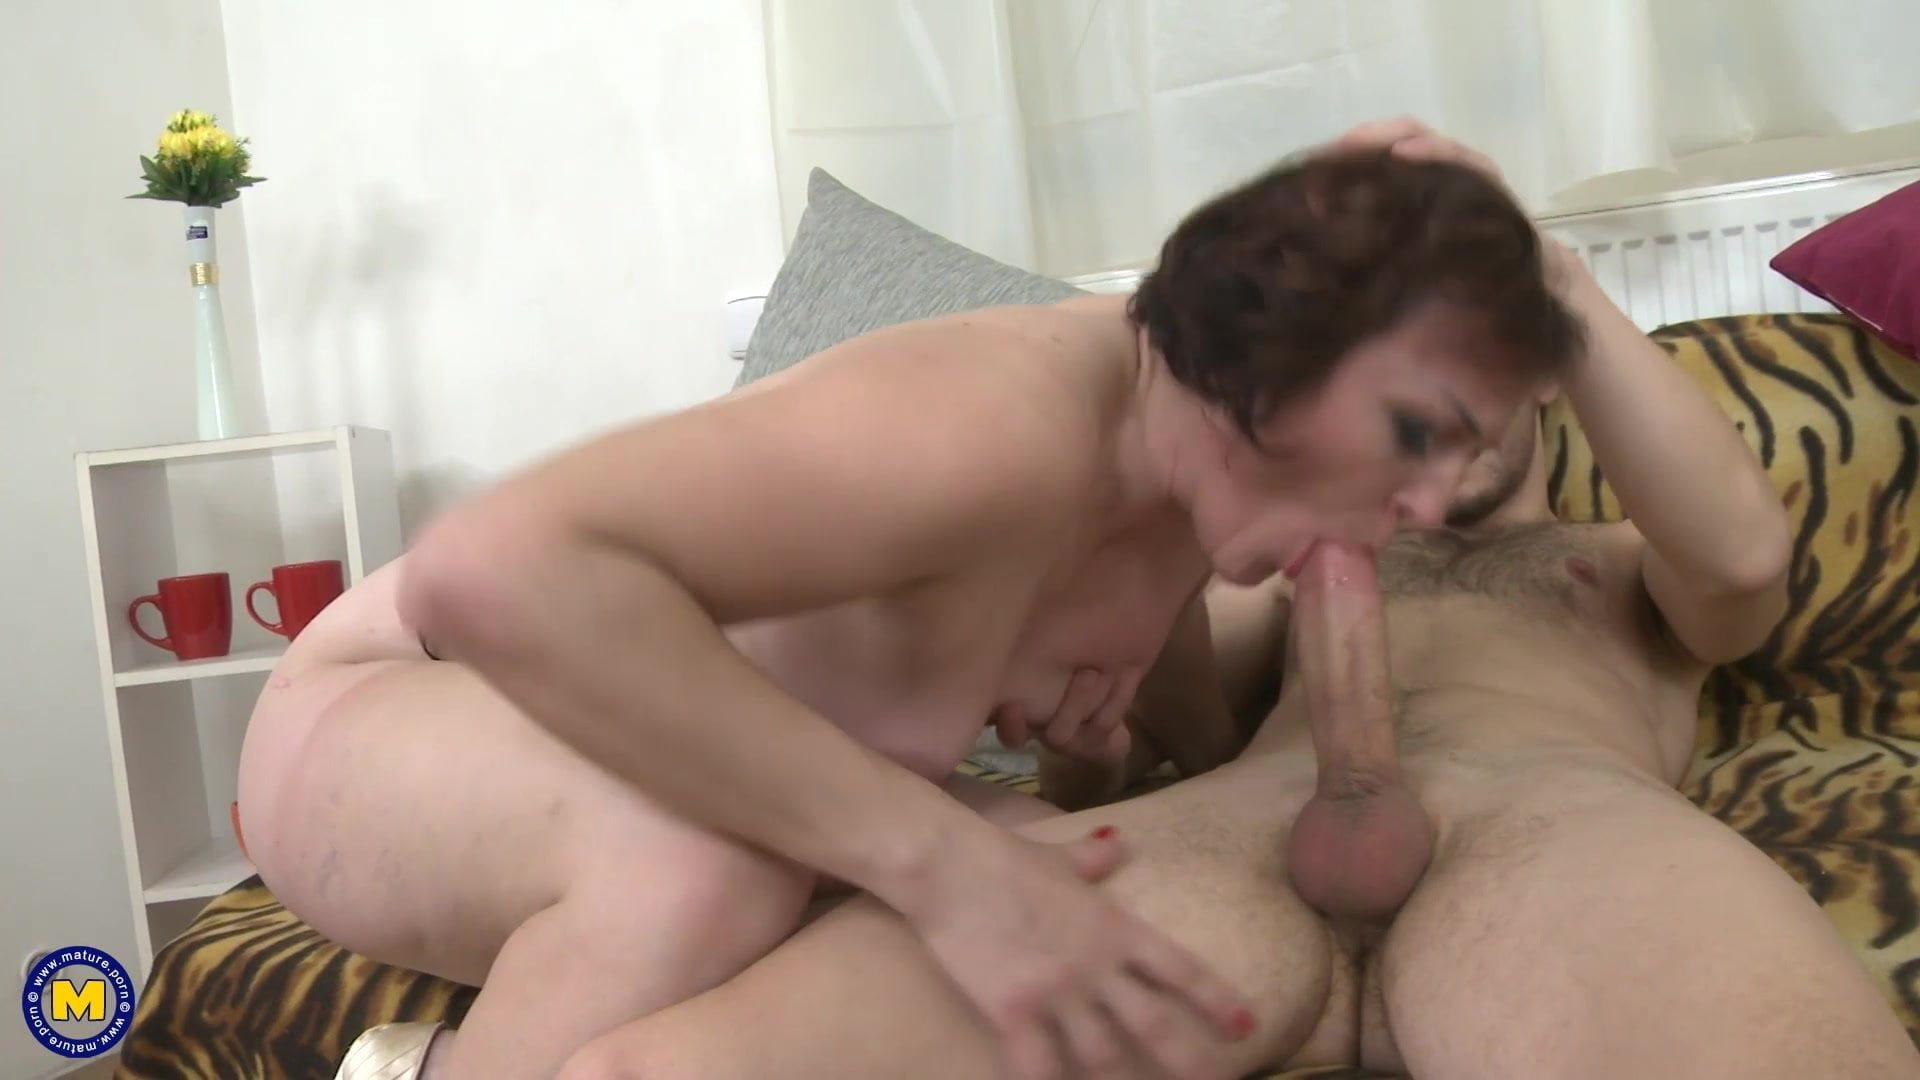 Ashley renee tied up